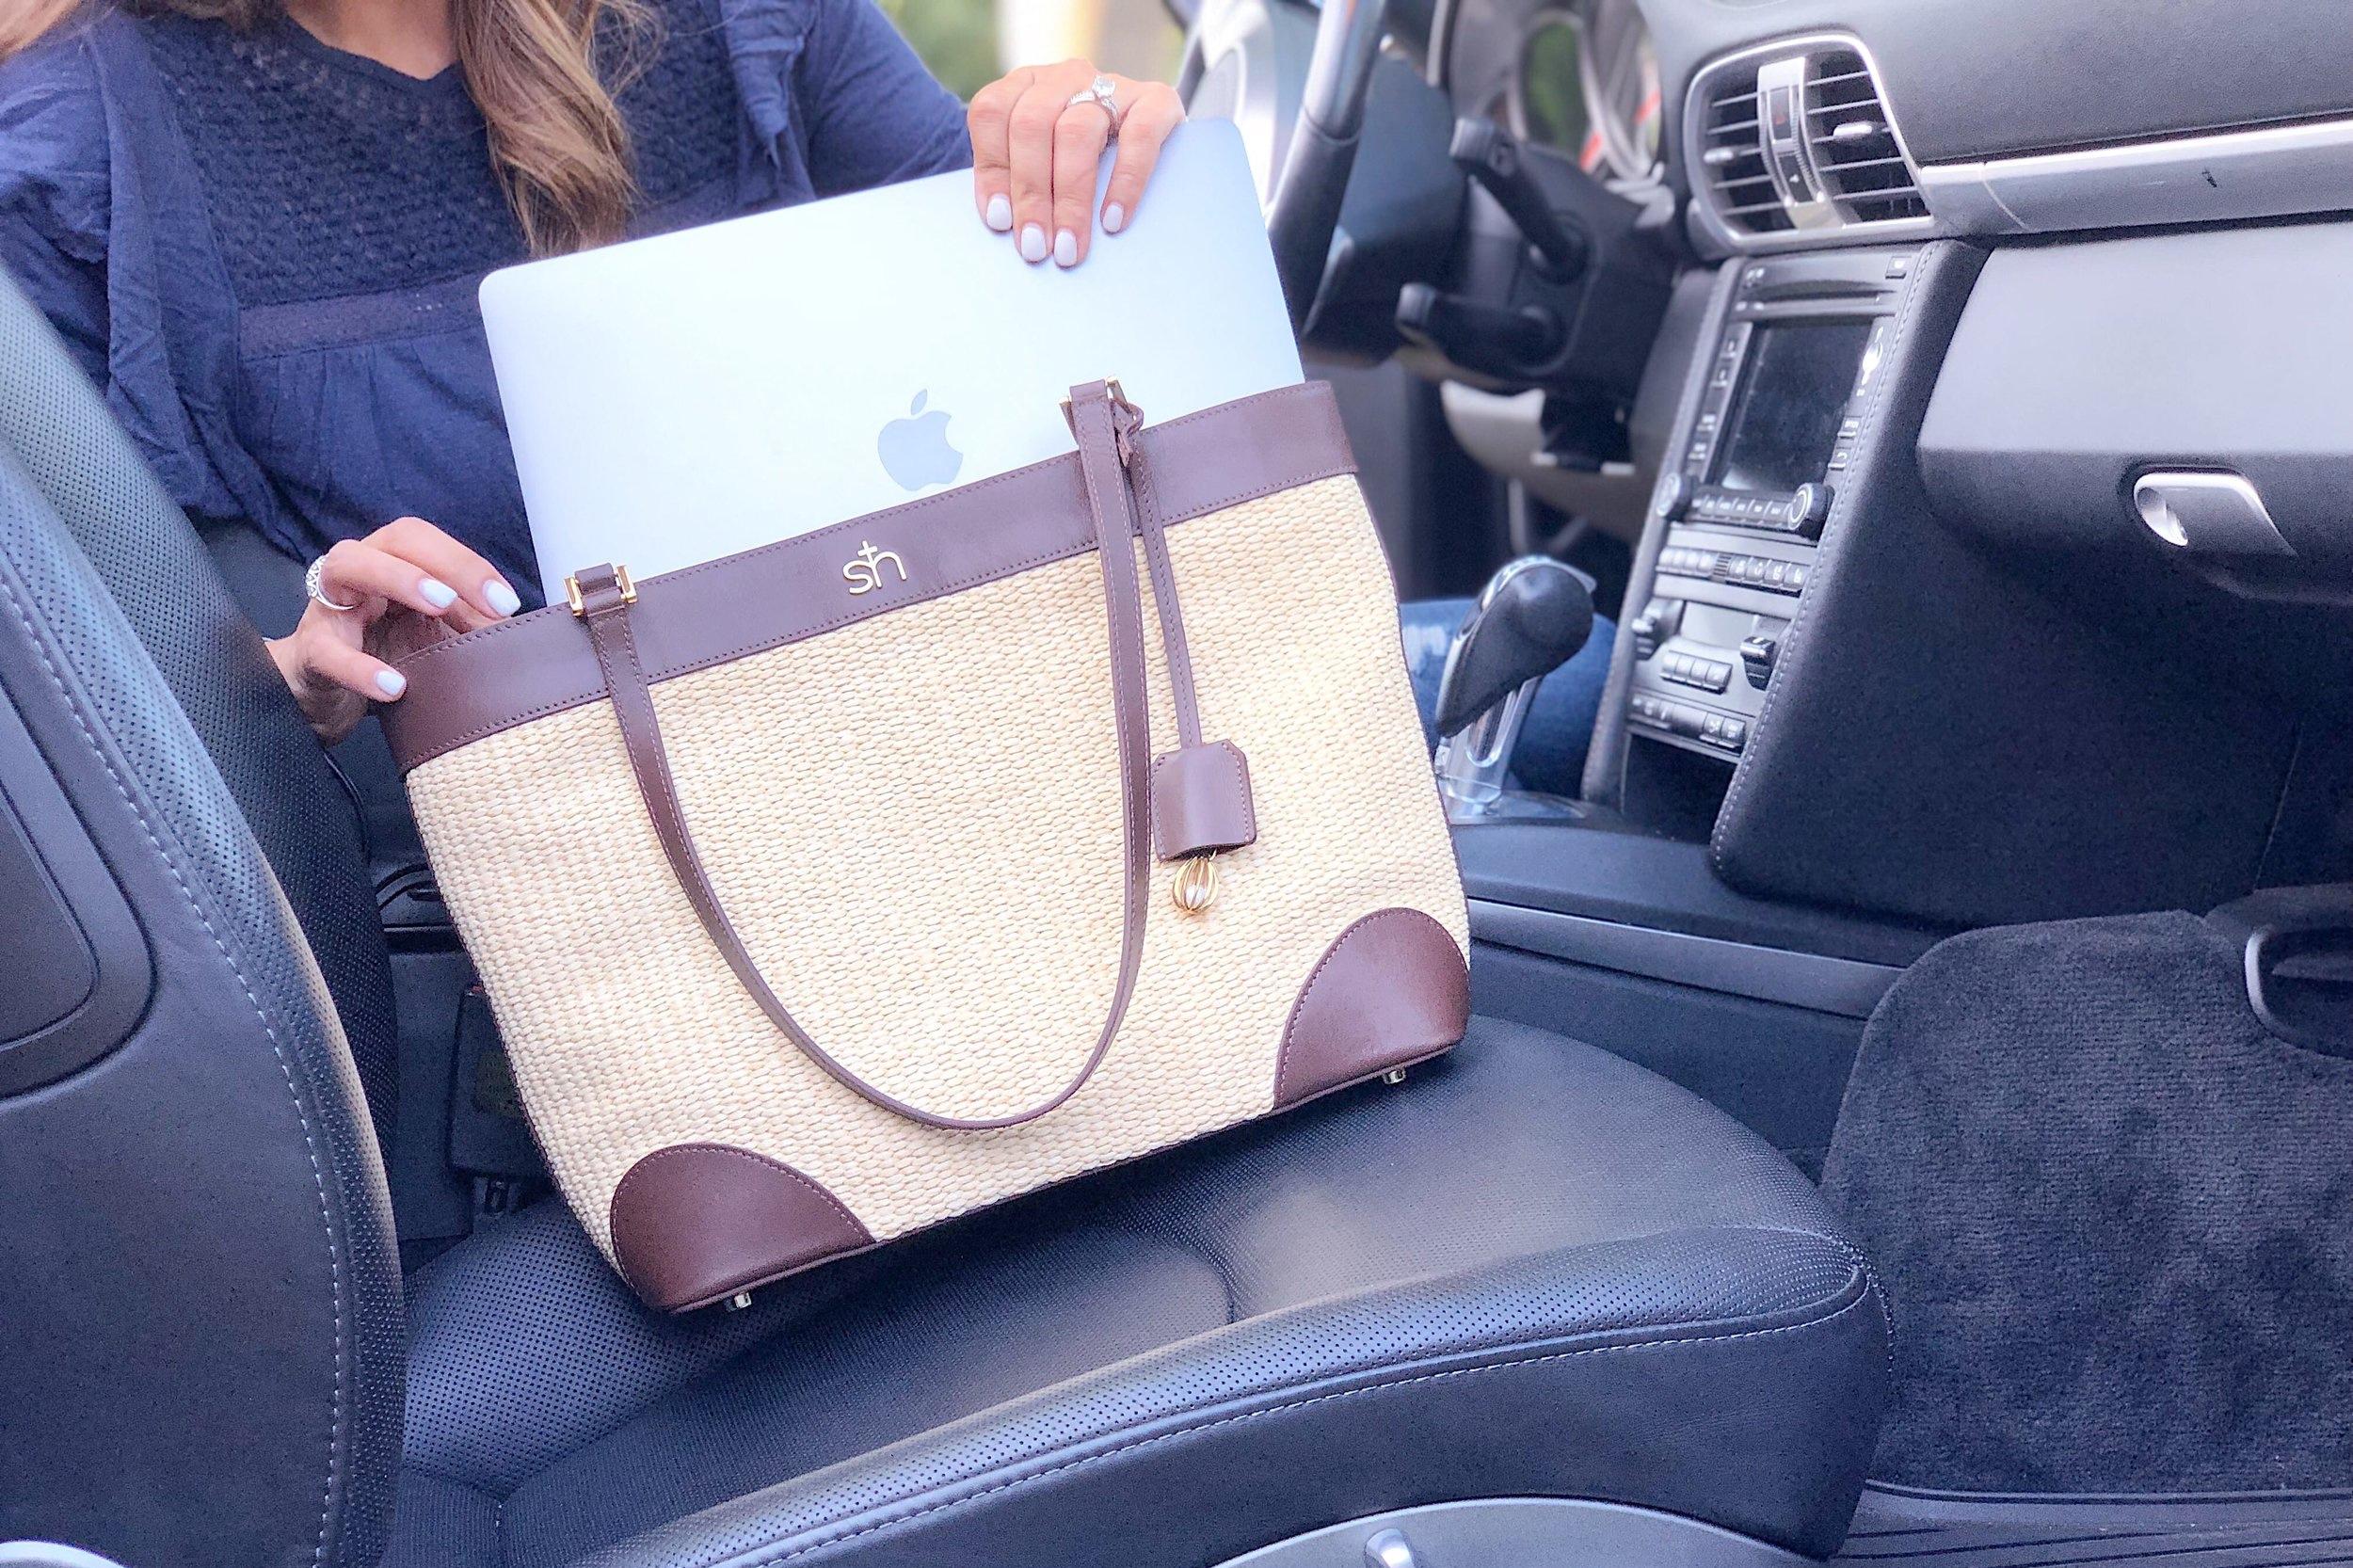 My 13-inch laptop fits easily inside the handbag.